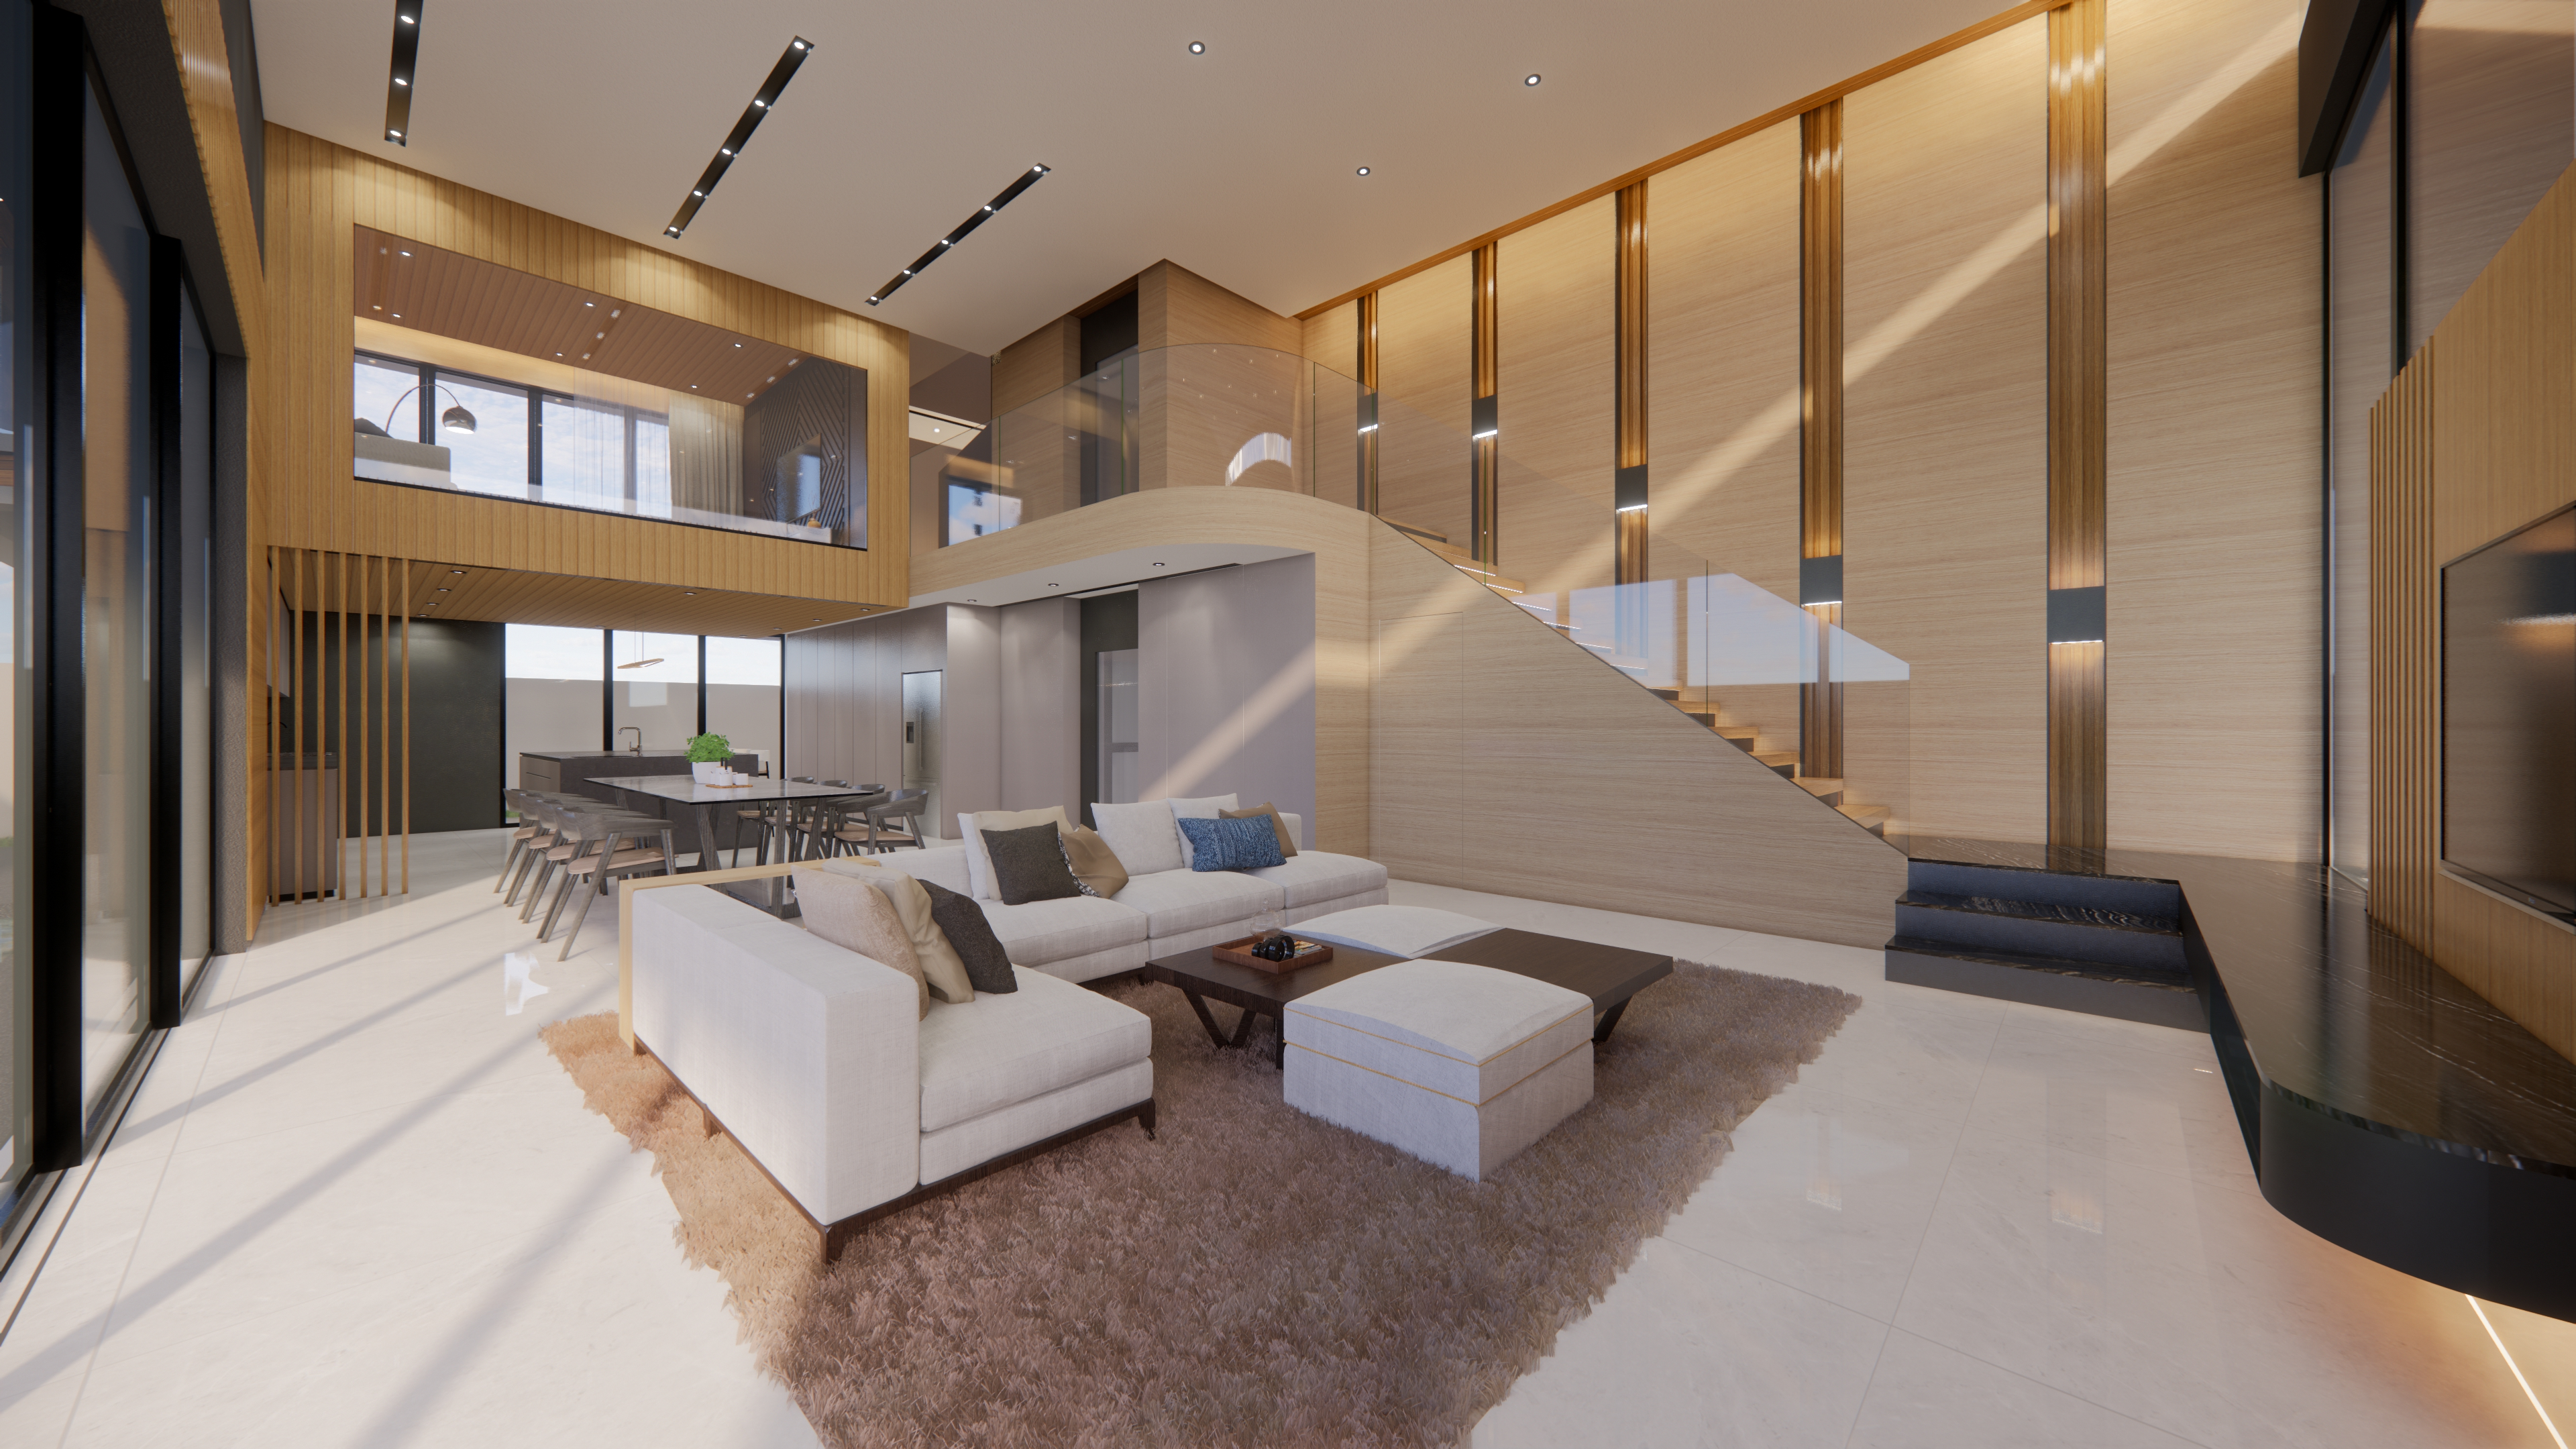 Brockhampton_Living Room 1